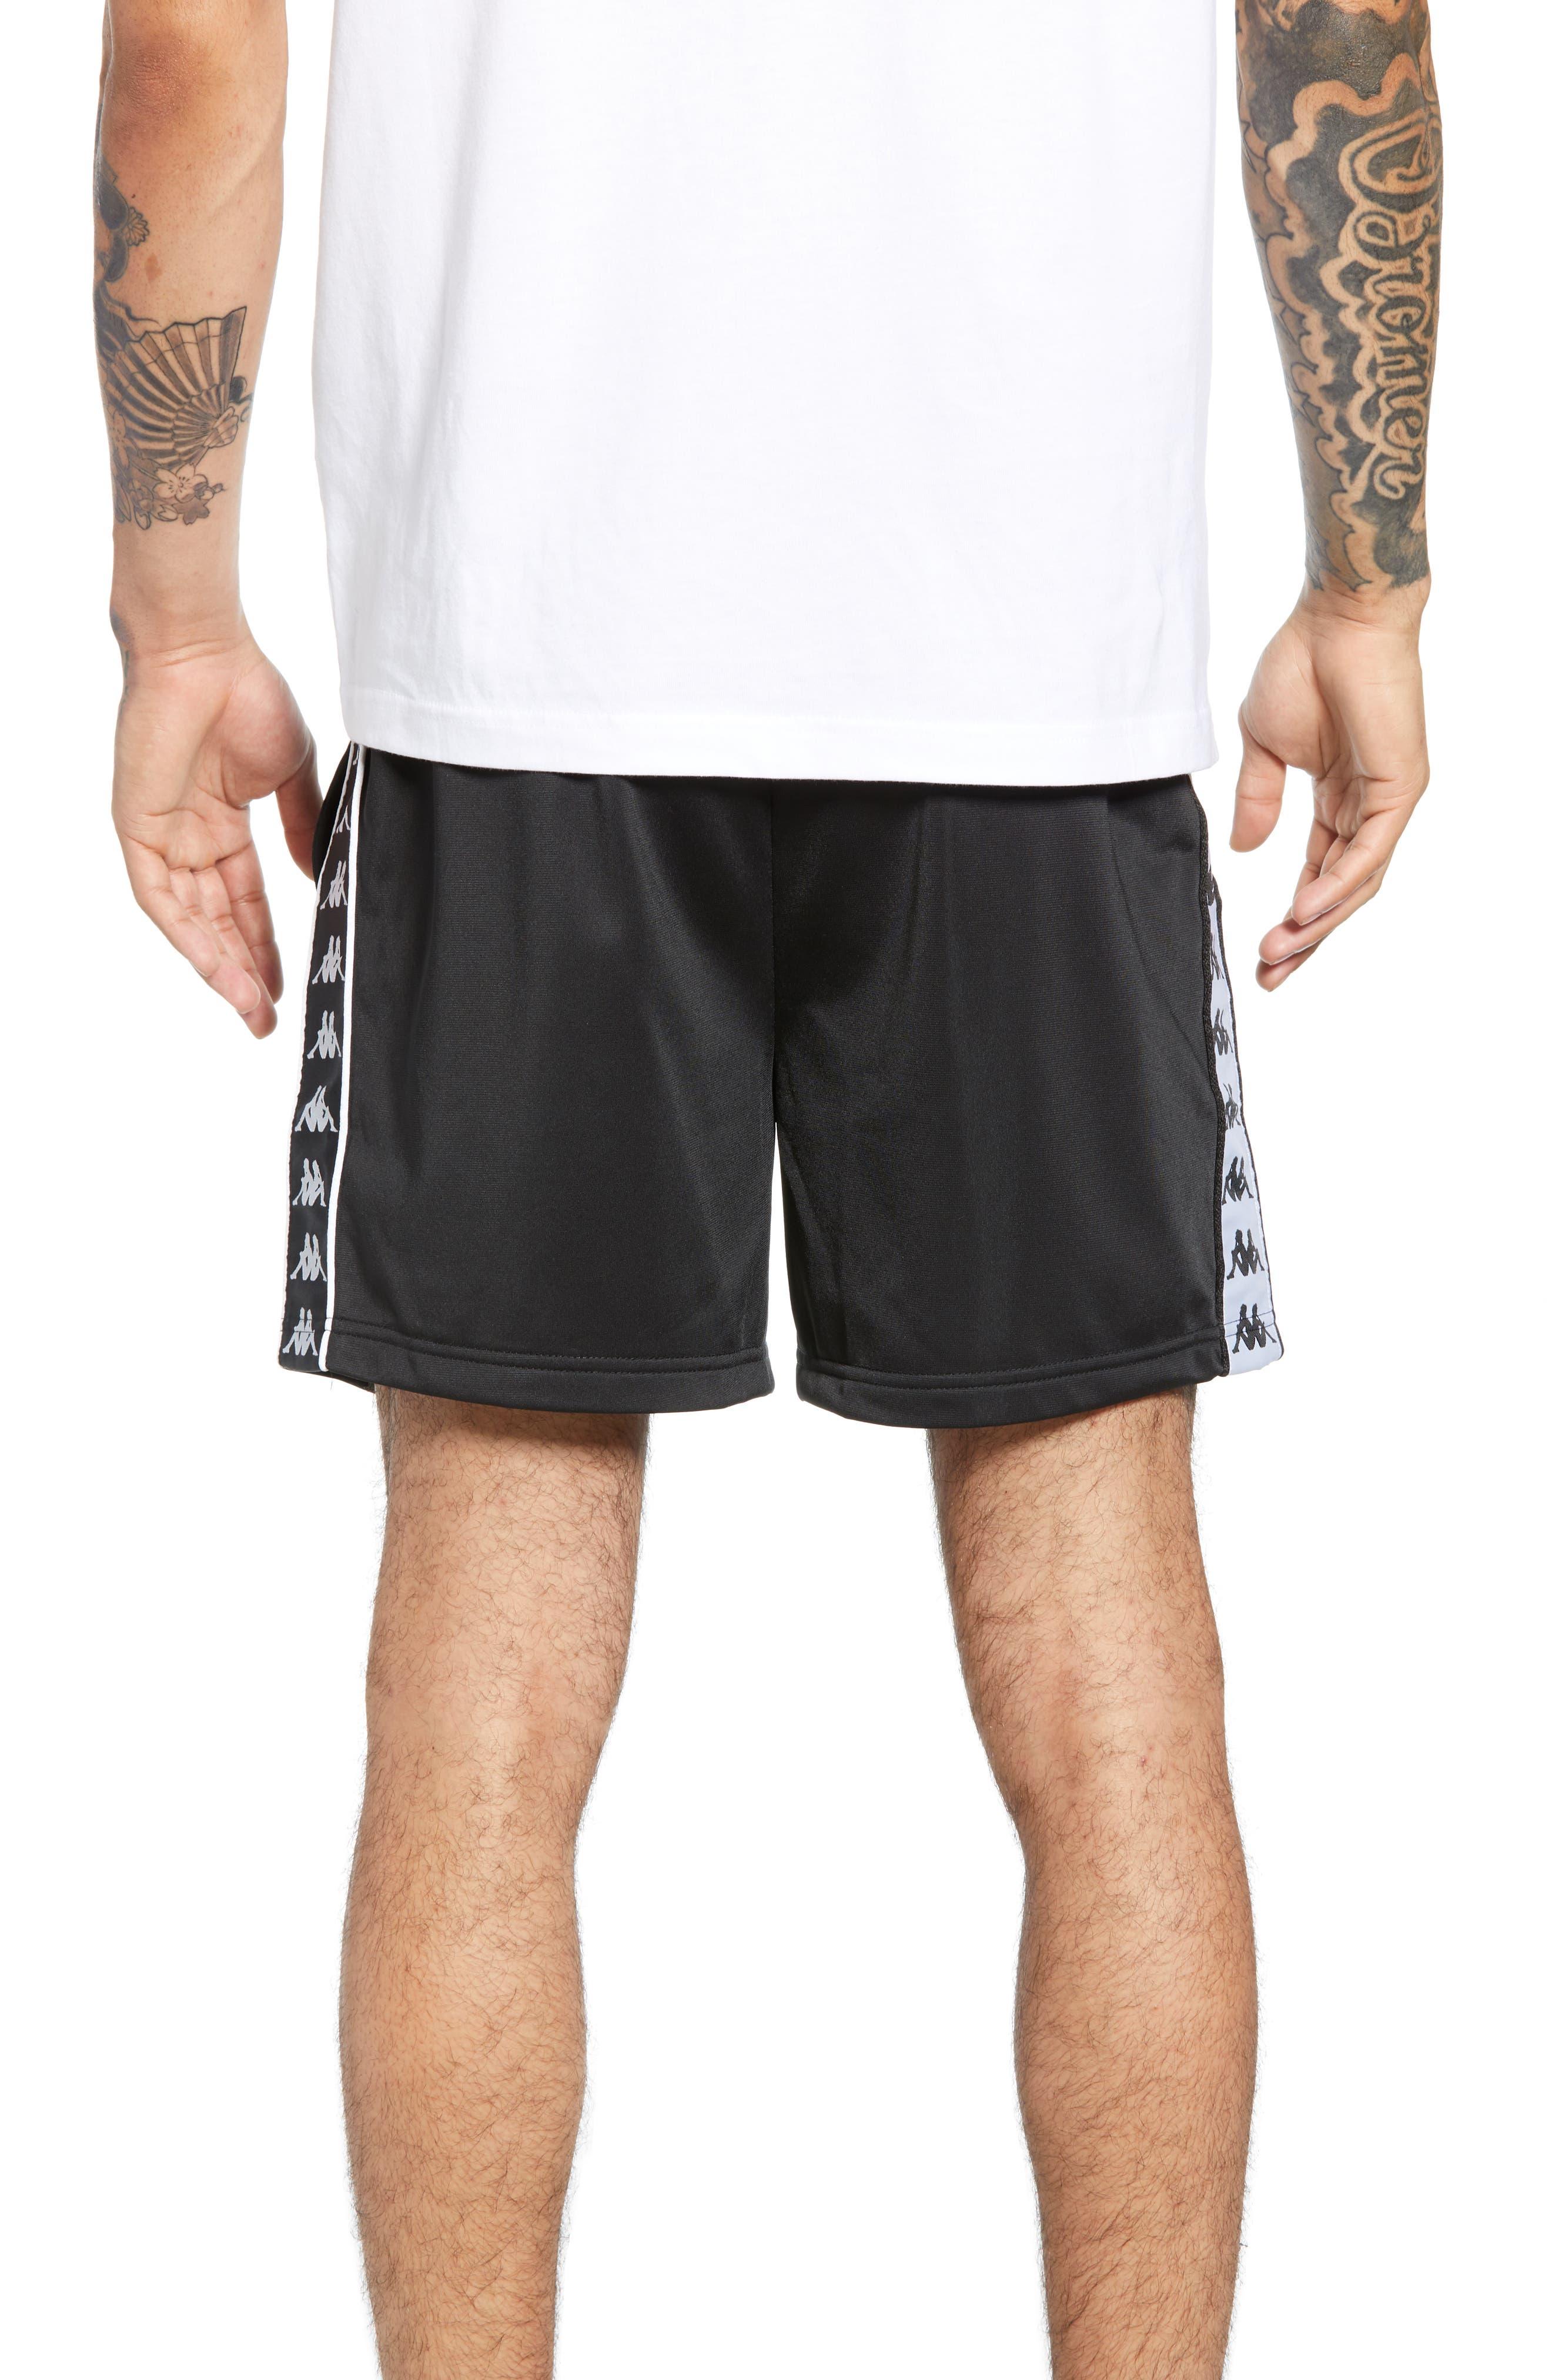 KAPPA, 222 Banda Cole Athletic Shorts, Alternate thumbnail 2, color, BLACK/ WHITE